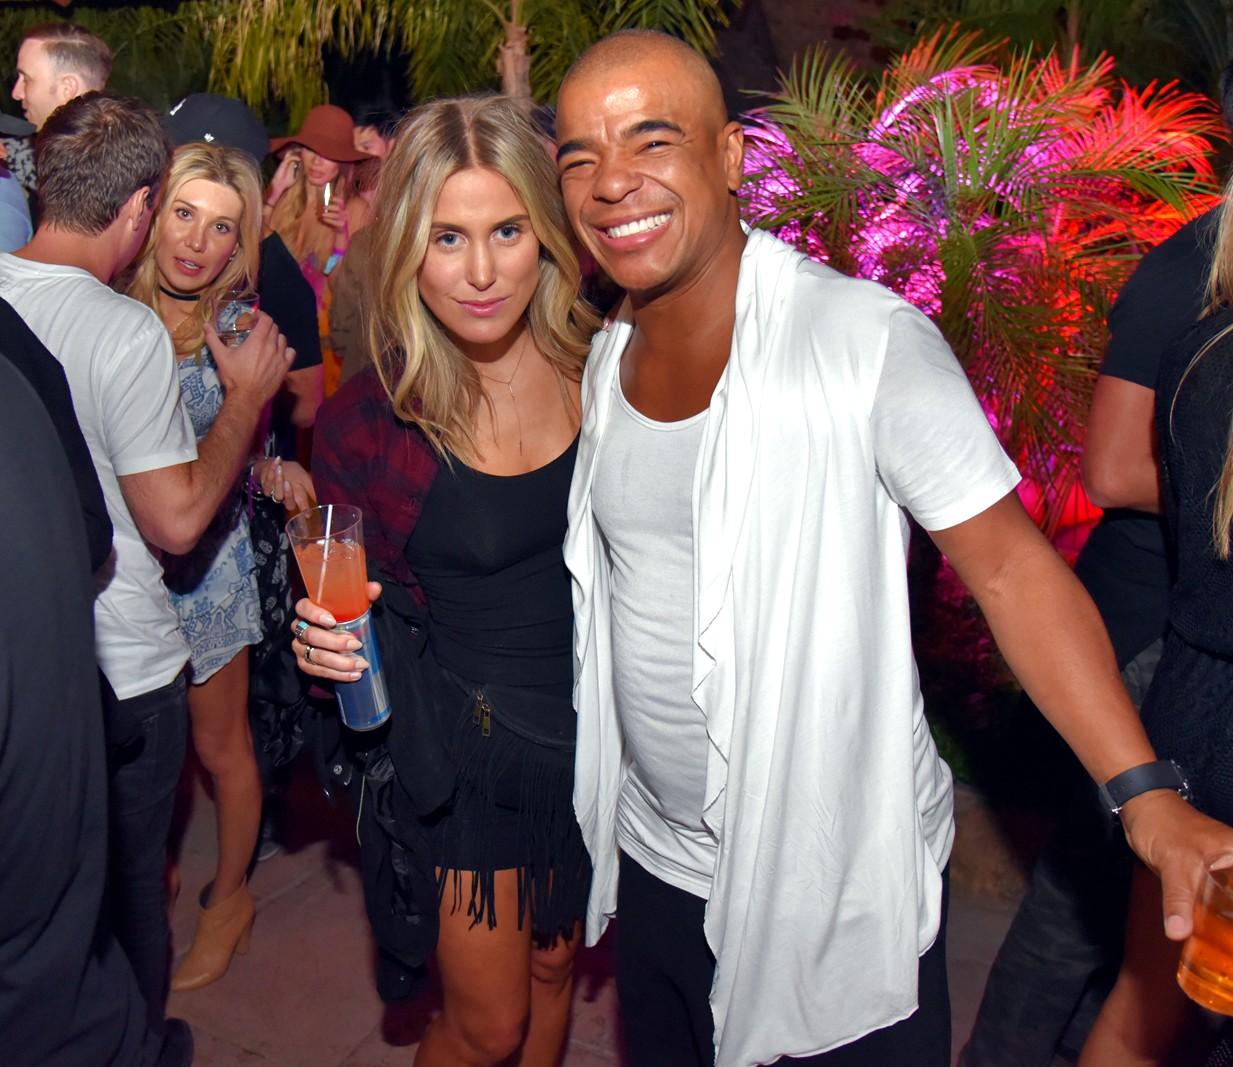 Bob Zangrillo party, Coachella, Erick Morillo 2